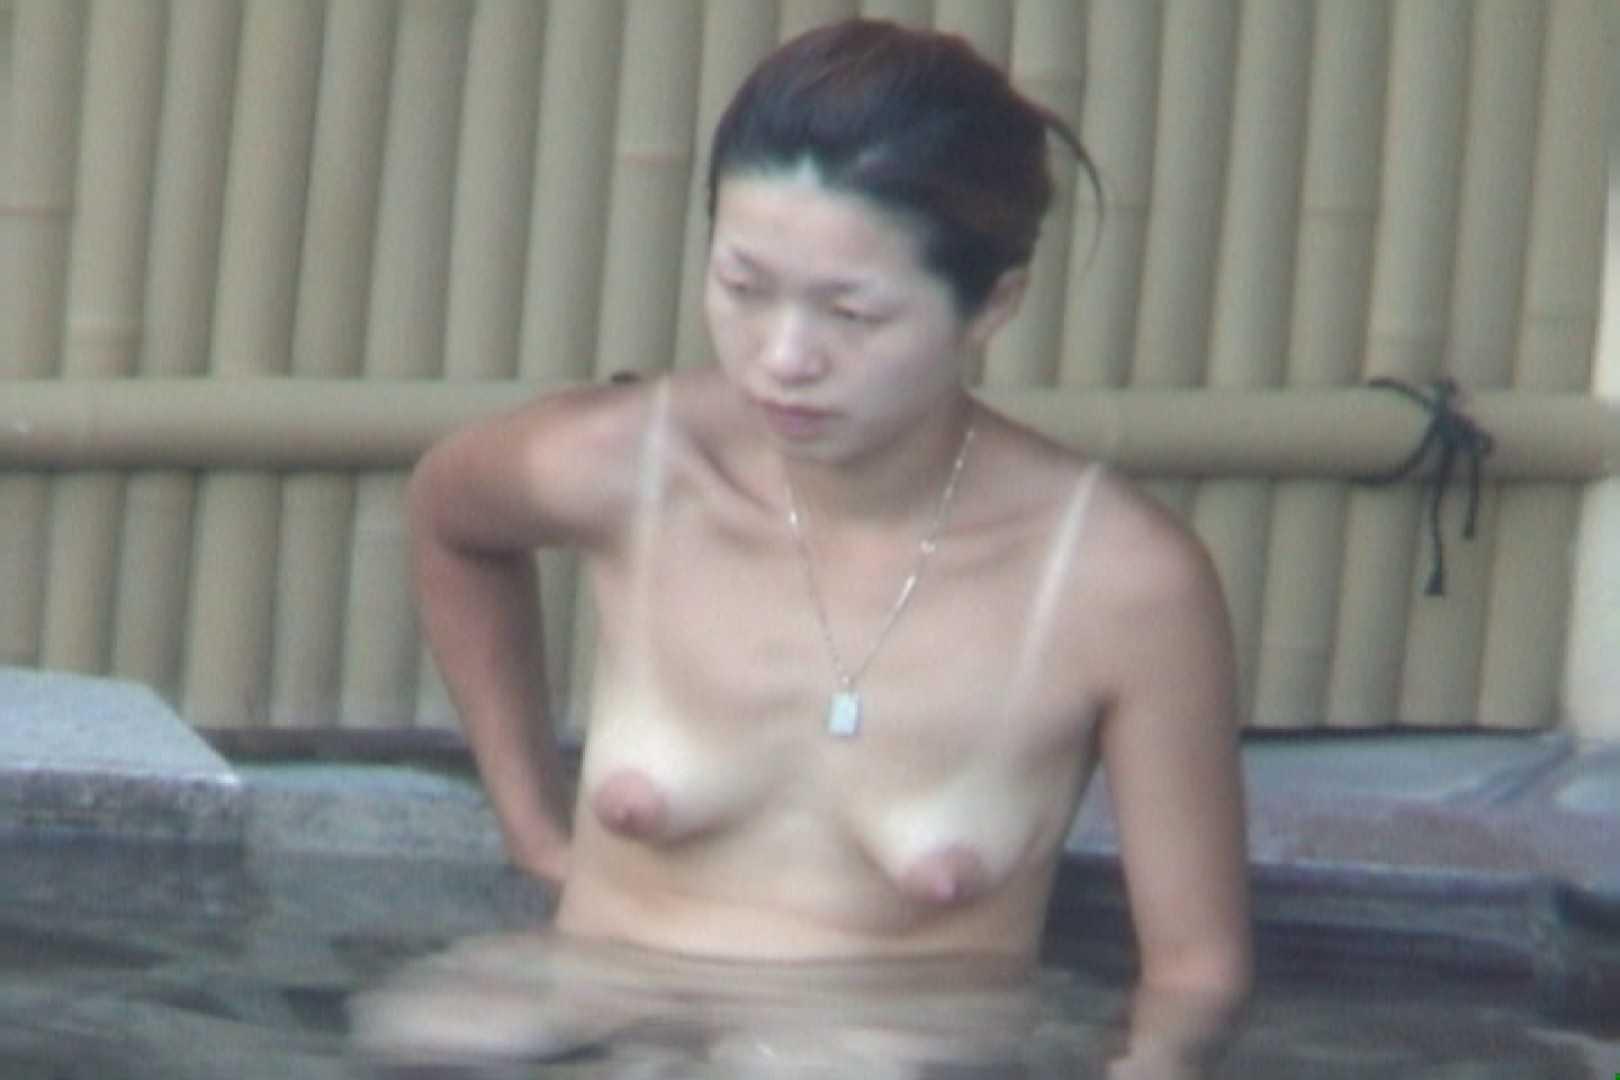 Aquaな露天風呂Vol.571 美しいOLの裸体 | 露天風呂突入  99pic 16